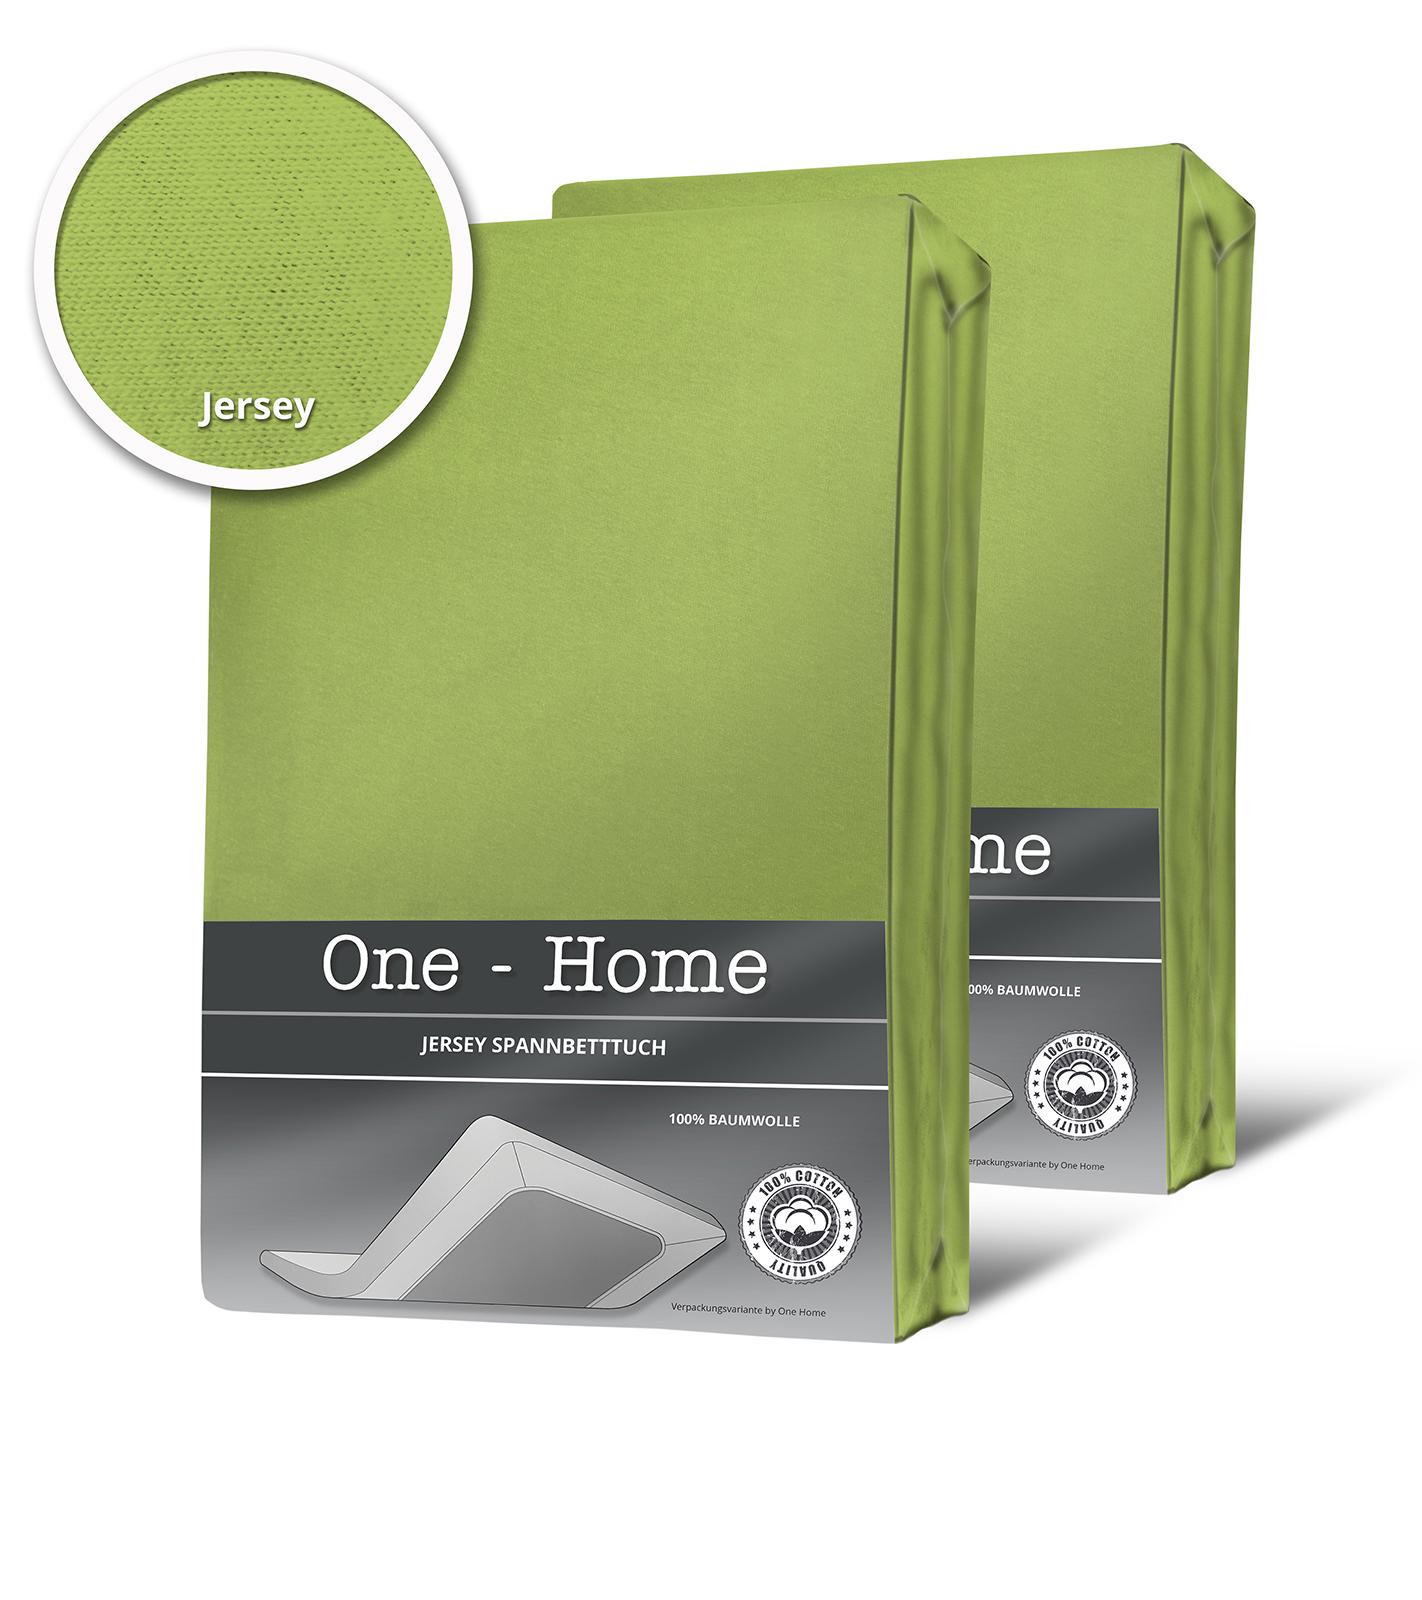 2er pack spannbettlaken bettlaken gr n 90x200 cm 100x200 cm jersey baumwolle spannbettlaken. Black Bedroom Furniture Sets. Home Design Ideas